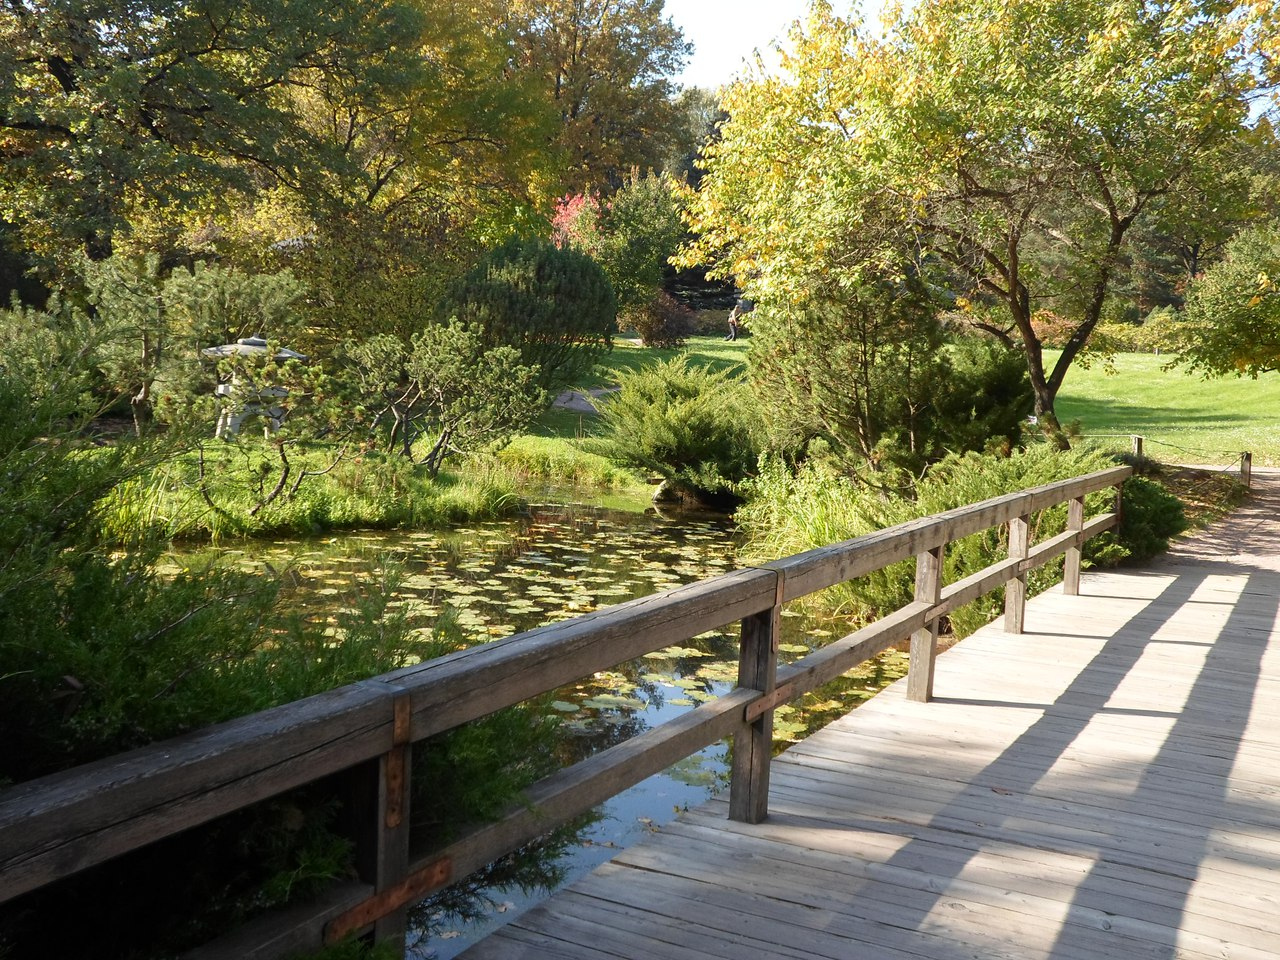 Японский сад москва 17 фотография